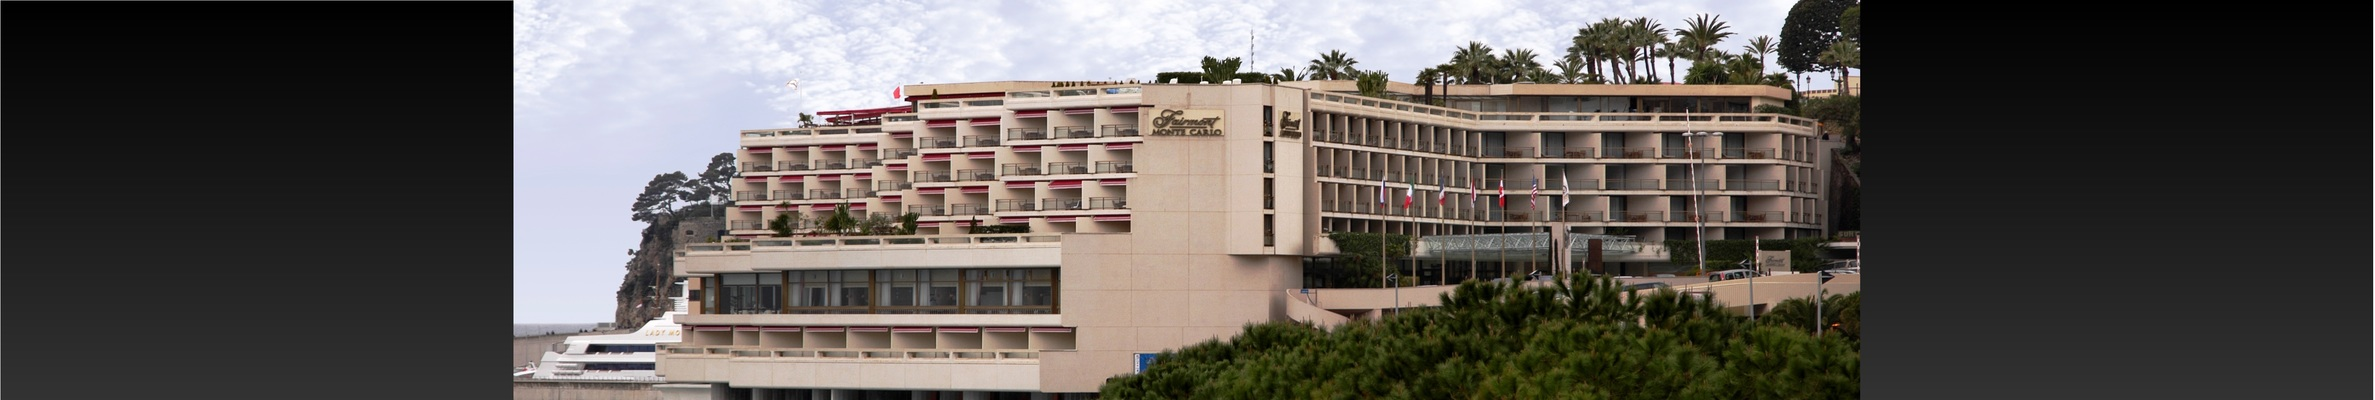 Fairmont Hotel - Monaco GP